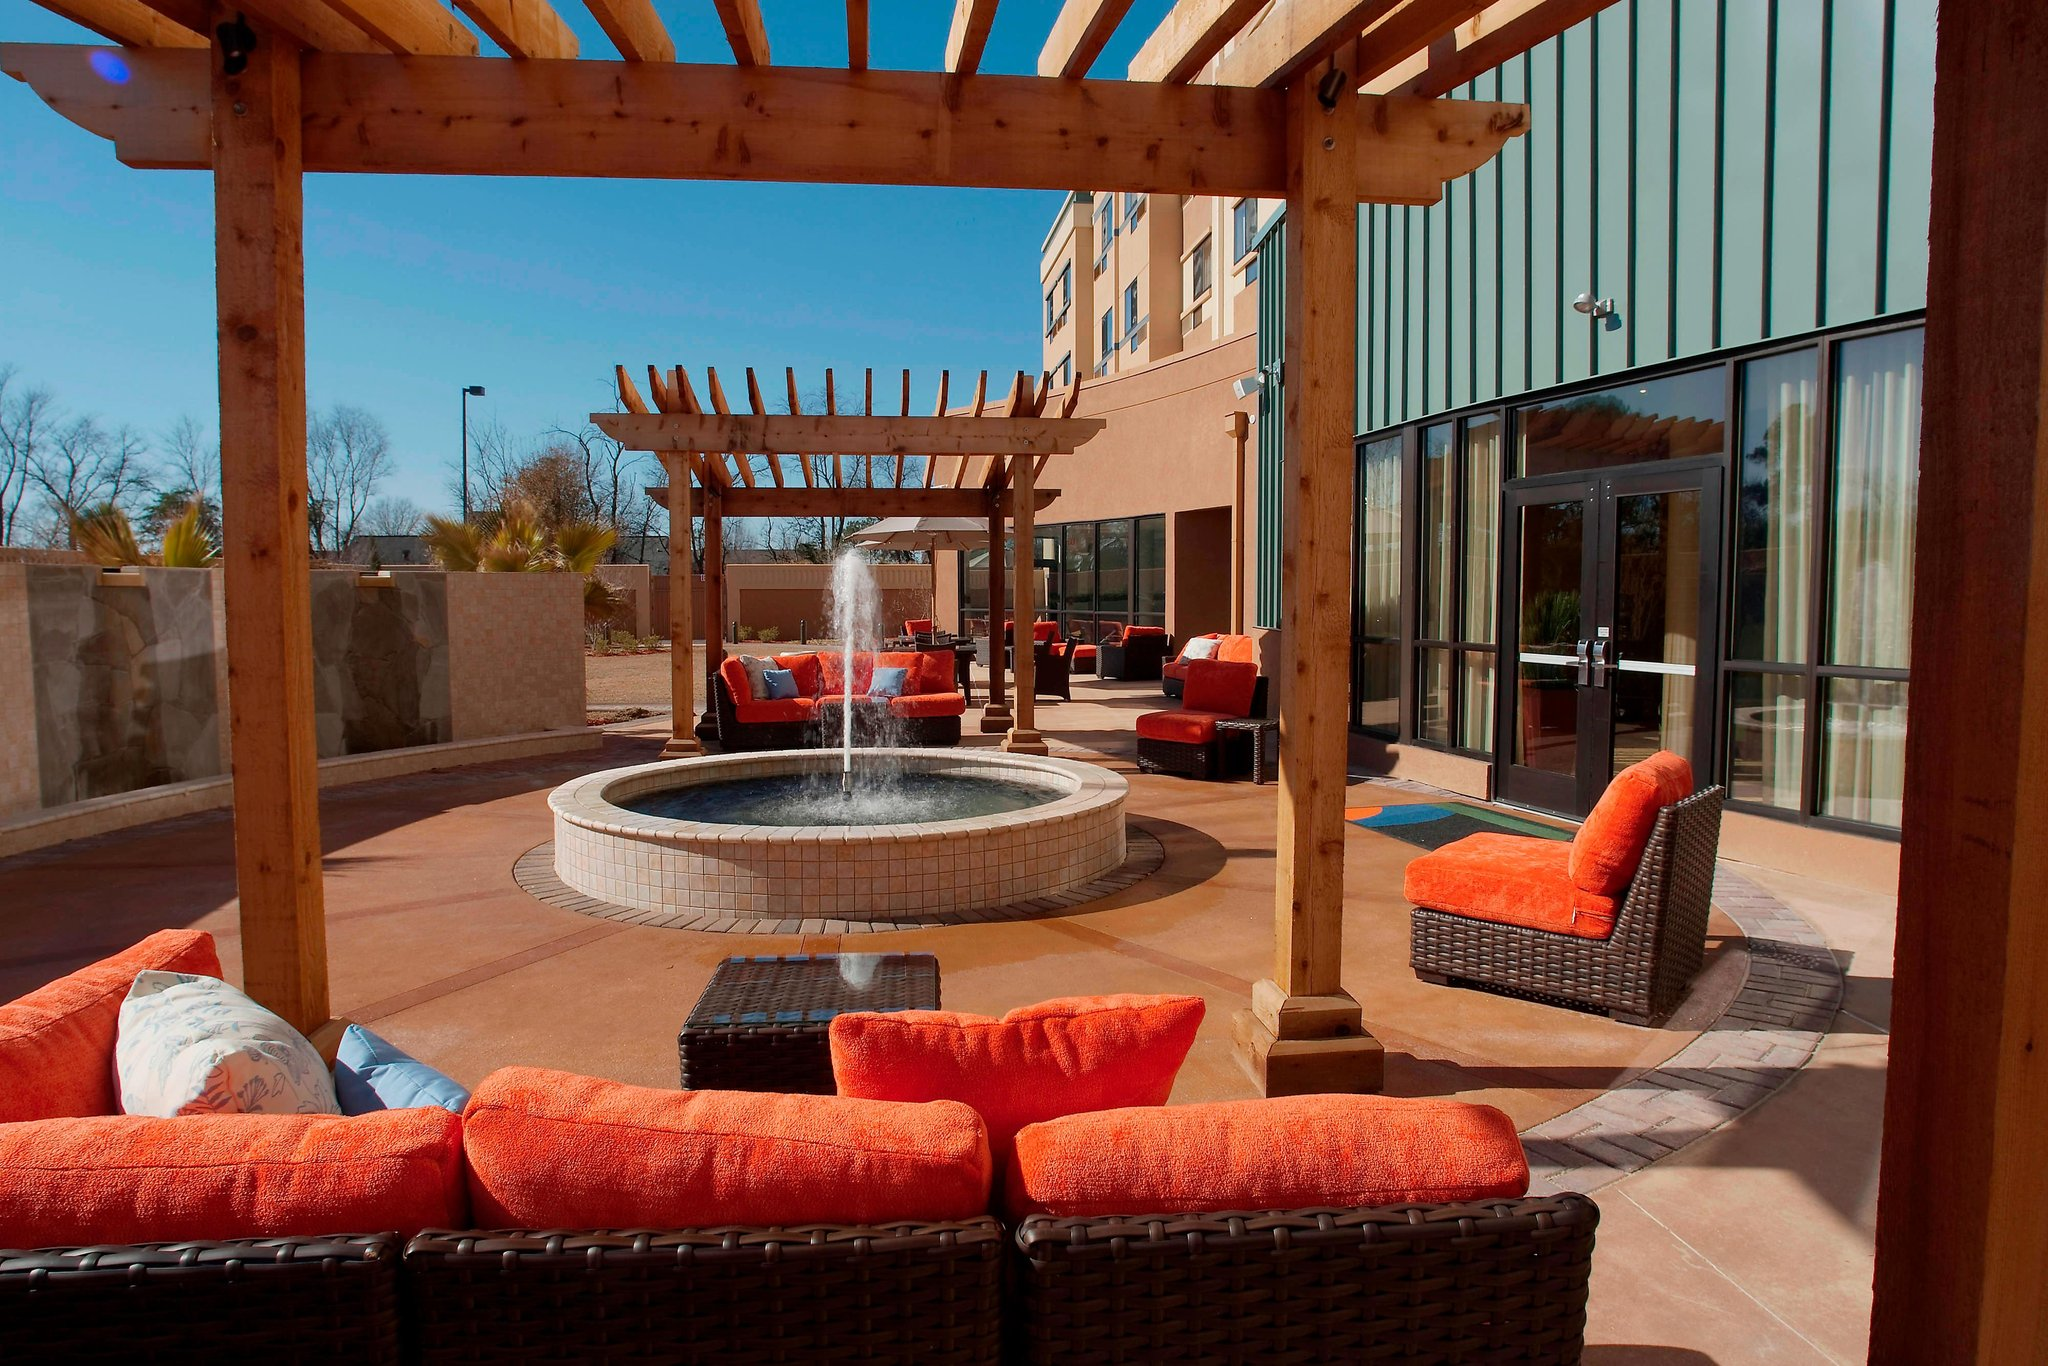 Courtyard by Marriott Warner Robins